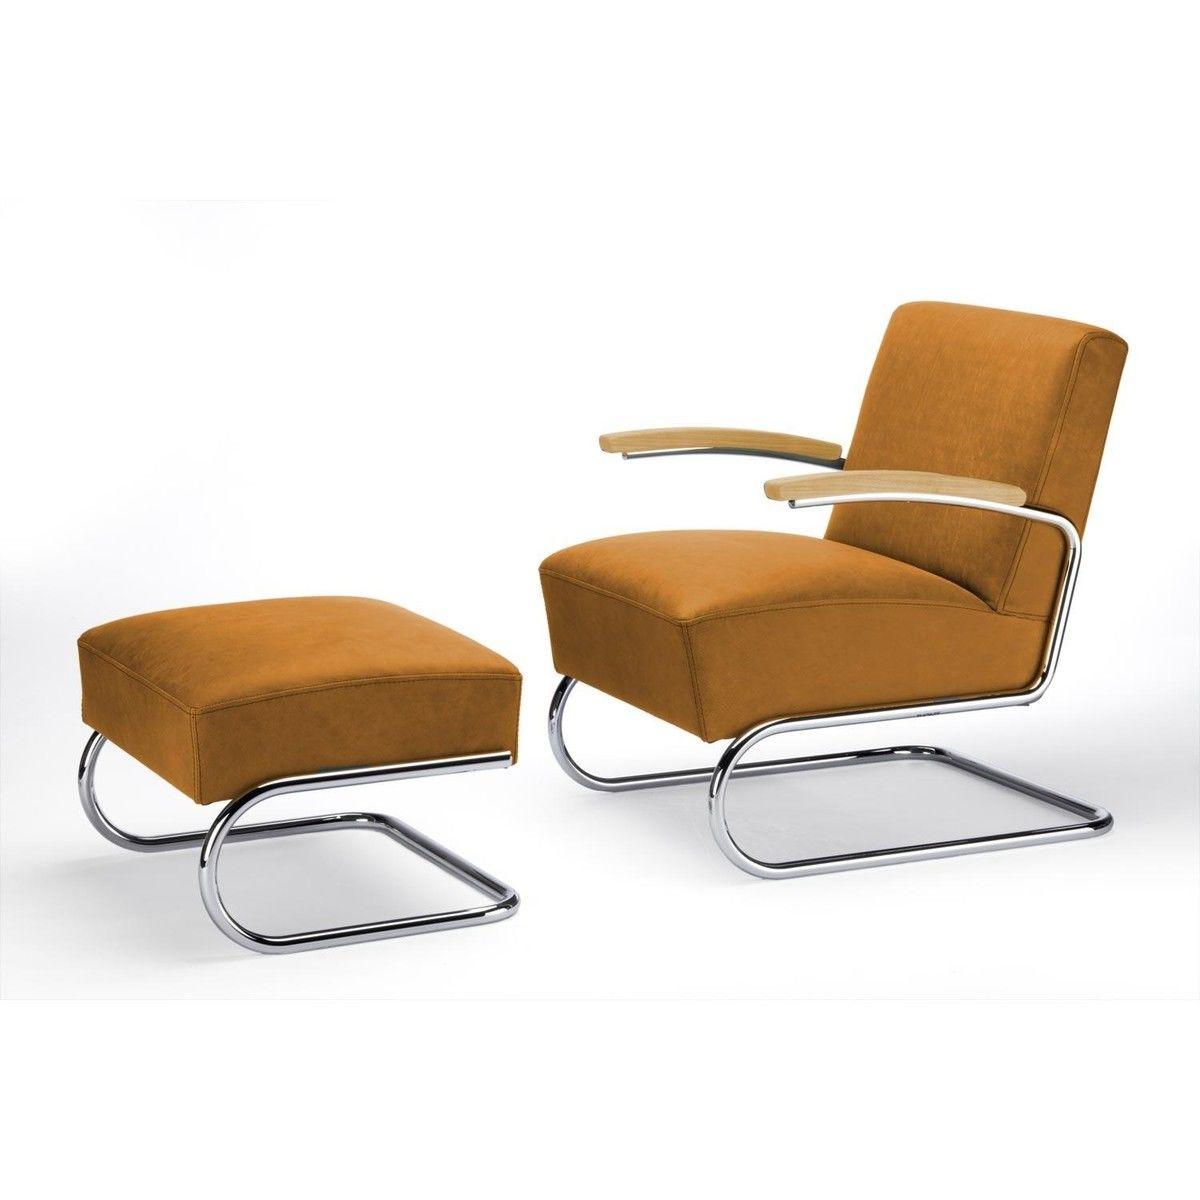 Sessel mit hocker modern m belideen for Sessel bunt mit hocker